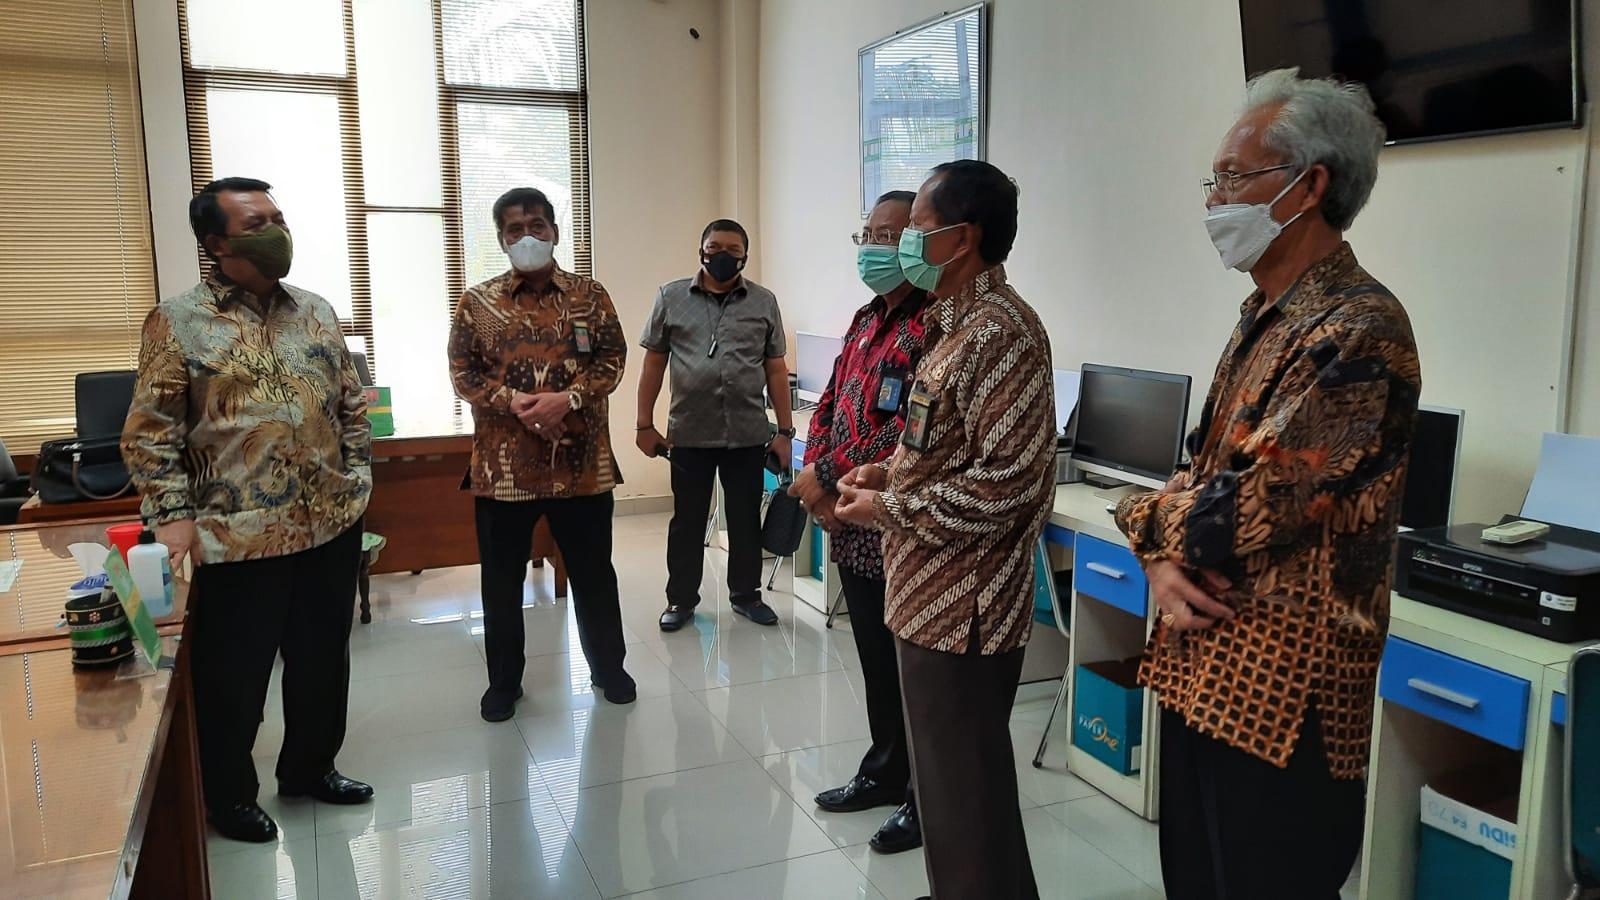 Kunjungi Pengadilan Di Wates, Ketua MA Ajak Seluruh Aparatur Bekerja Dengan Ikhlas